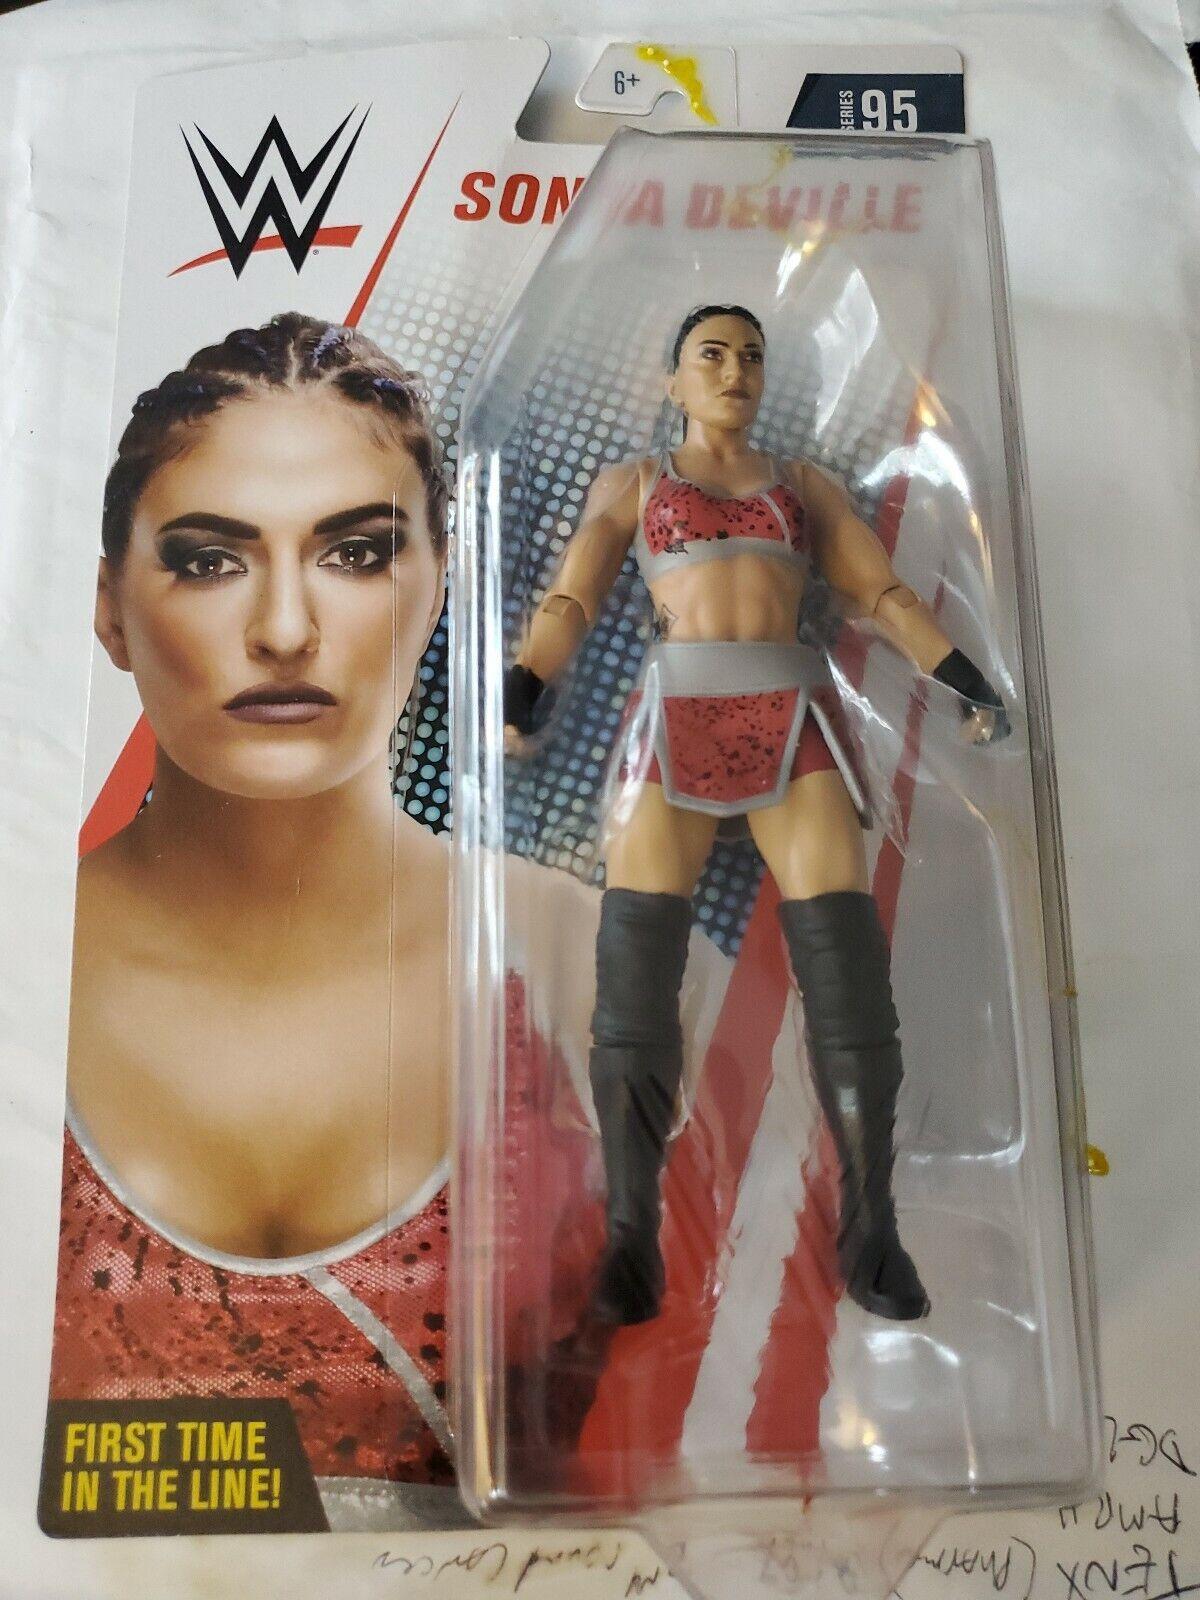 SONYA Deville WWE Mattel Basic Core Series 95 Wrestling Action Figure Jouet-NEUF!